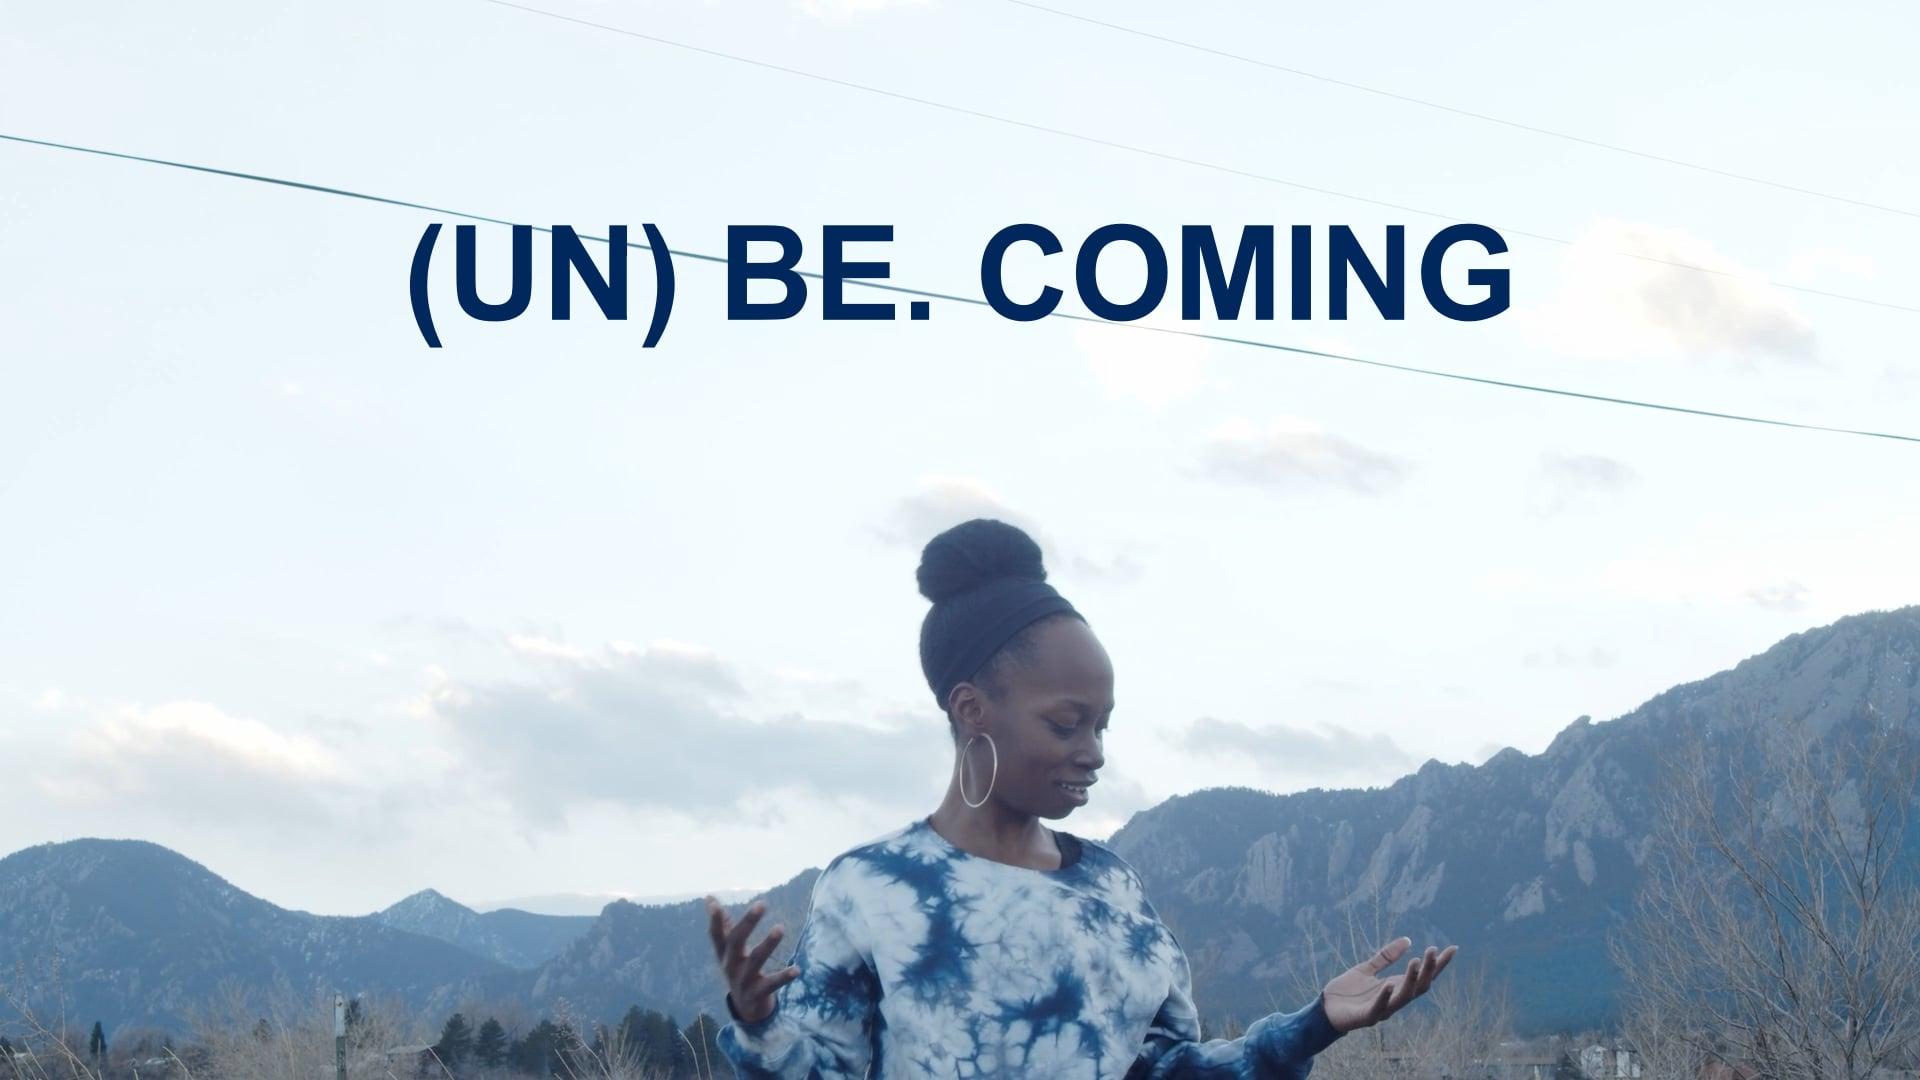 (UN) BE. COMING Trailer